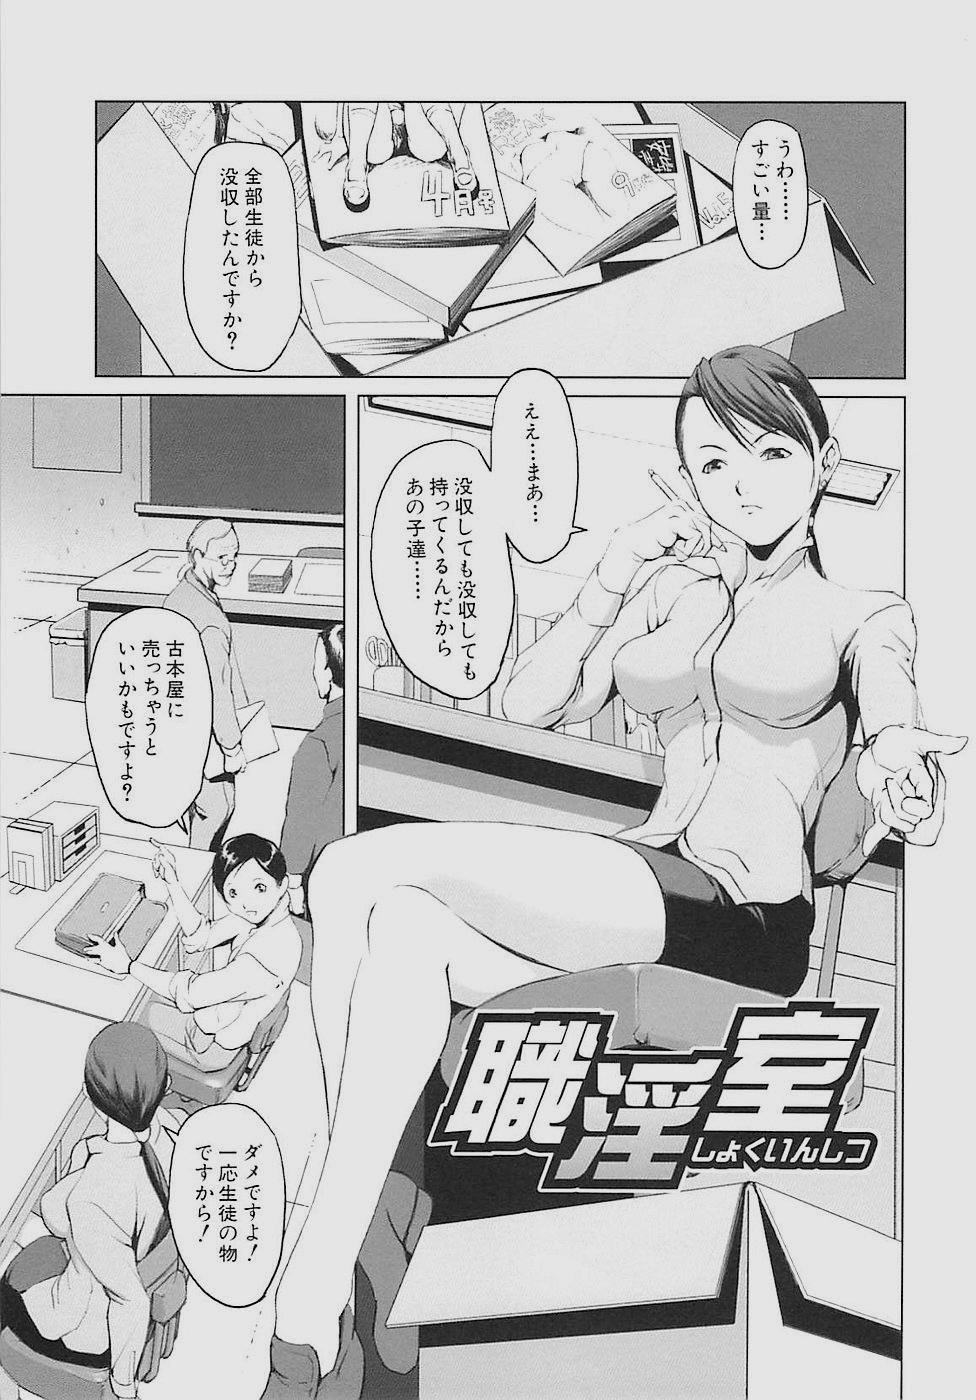 Inkoukamitsu 140